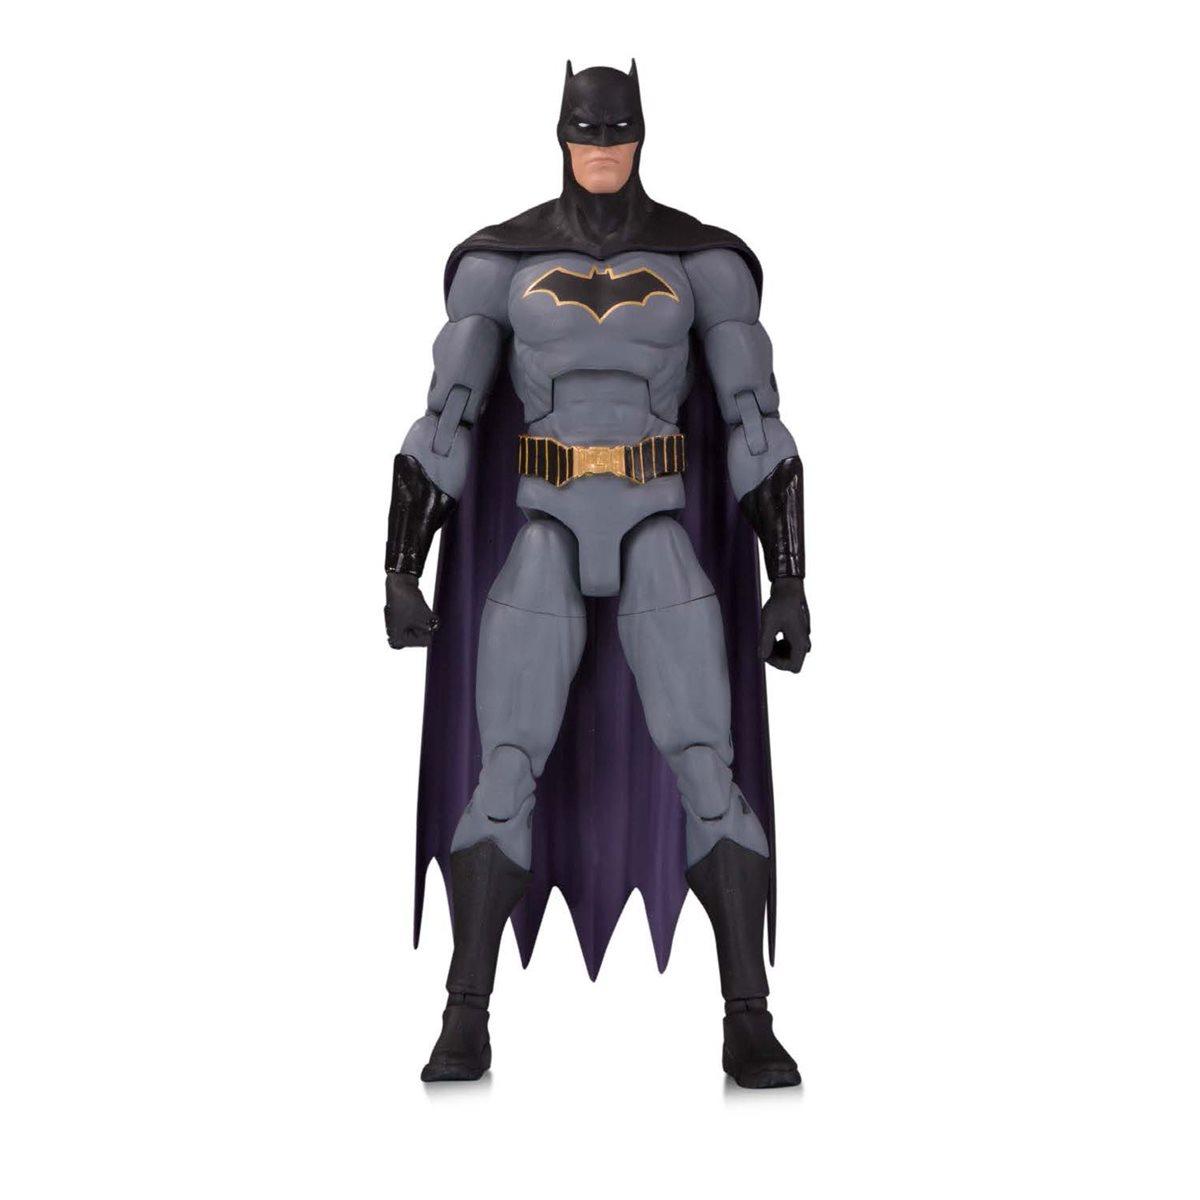 DC Essentials The Joker 7 inch Action Figure